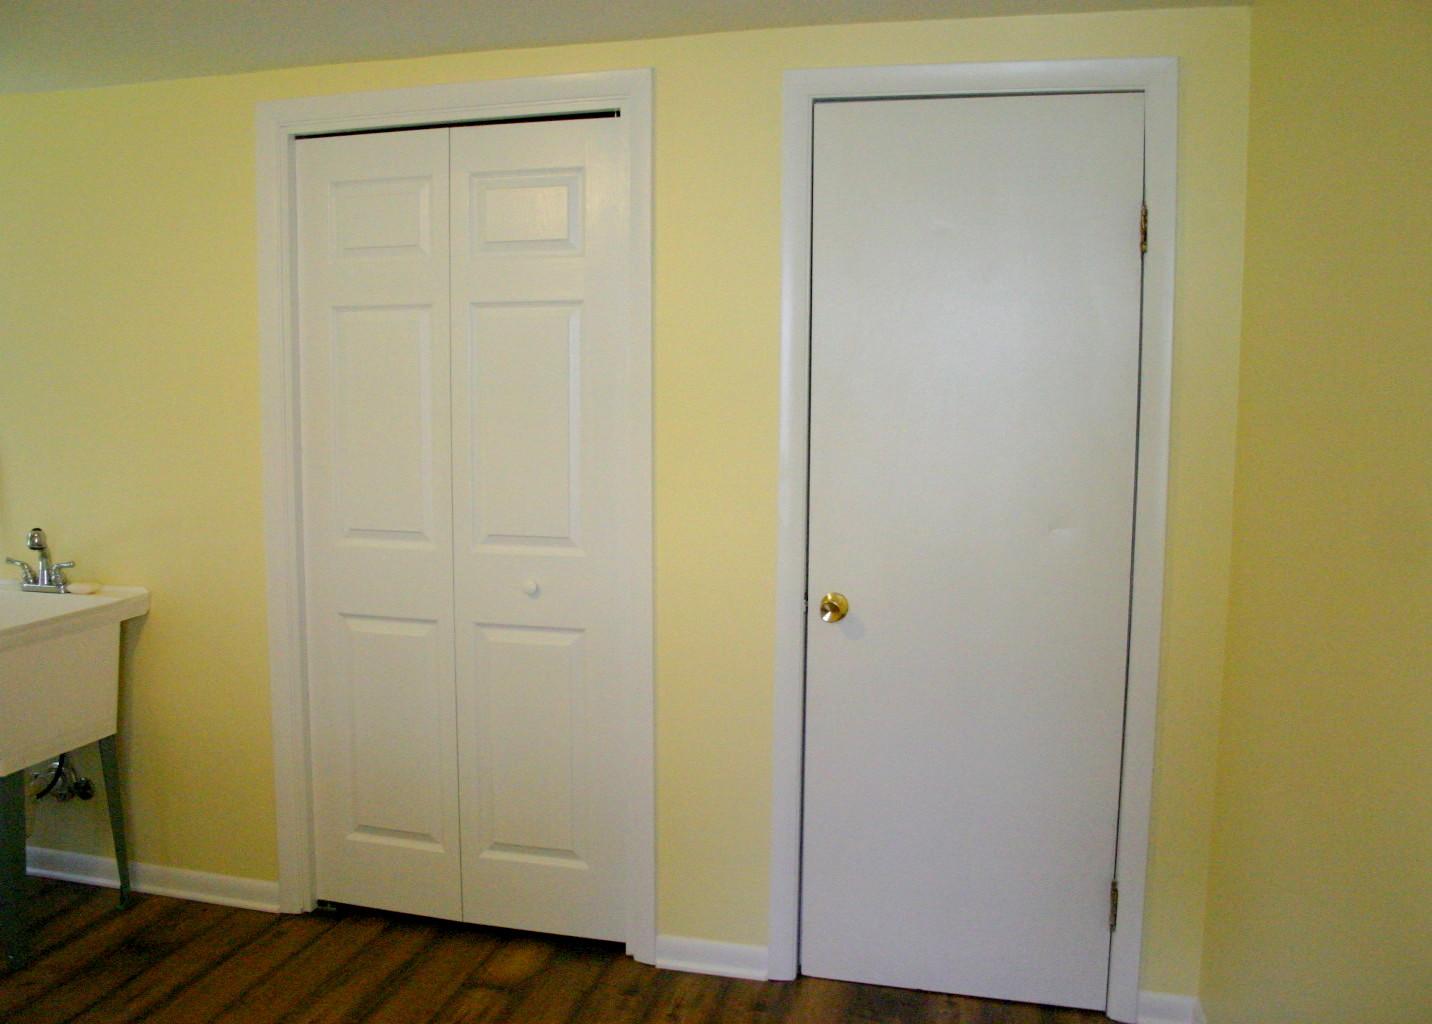 closeing door sound effect. Black Bedroom Furniture Sets. Home Design Ideas